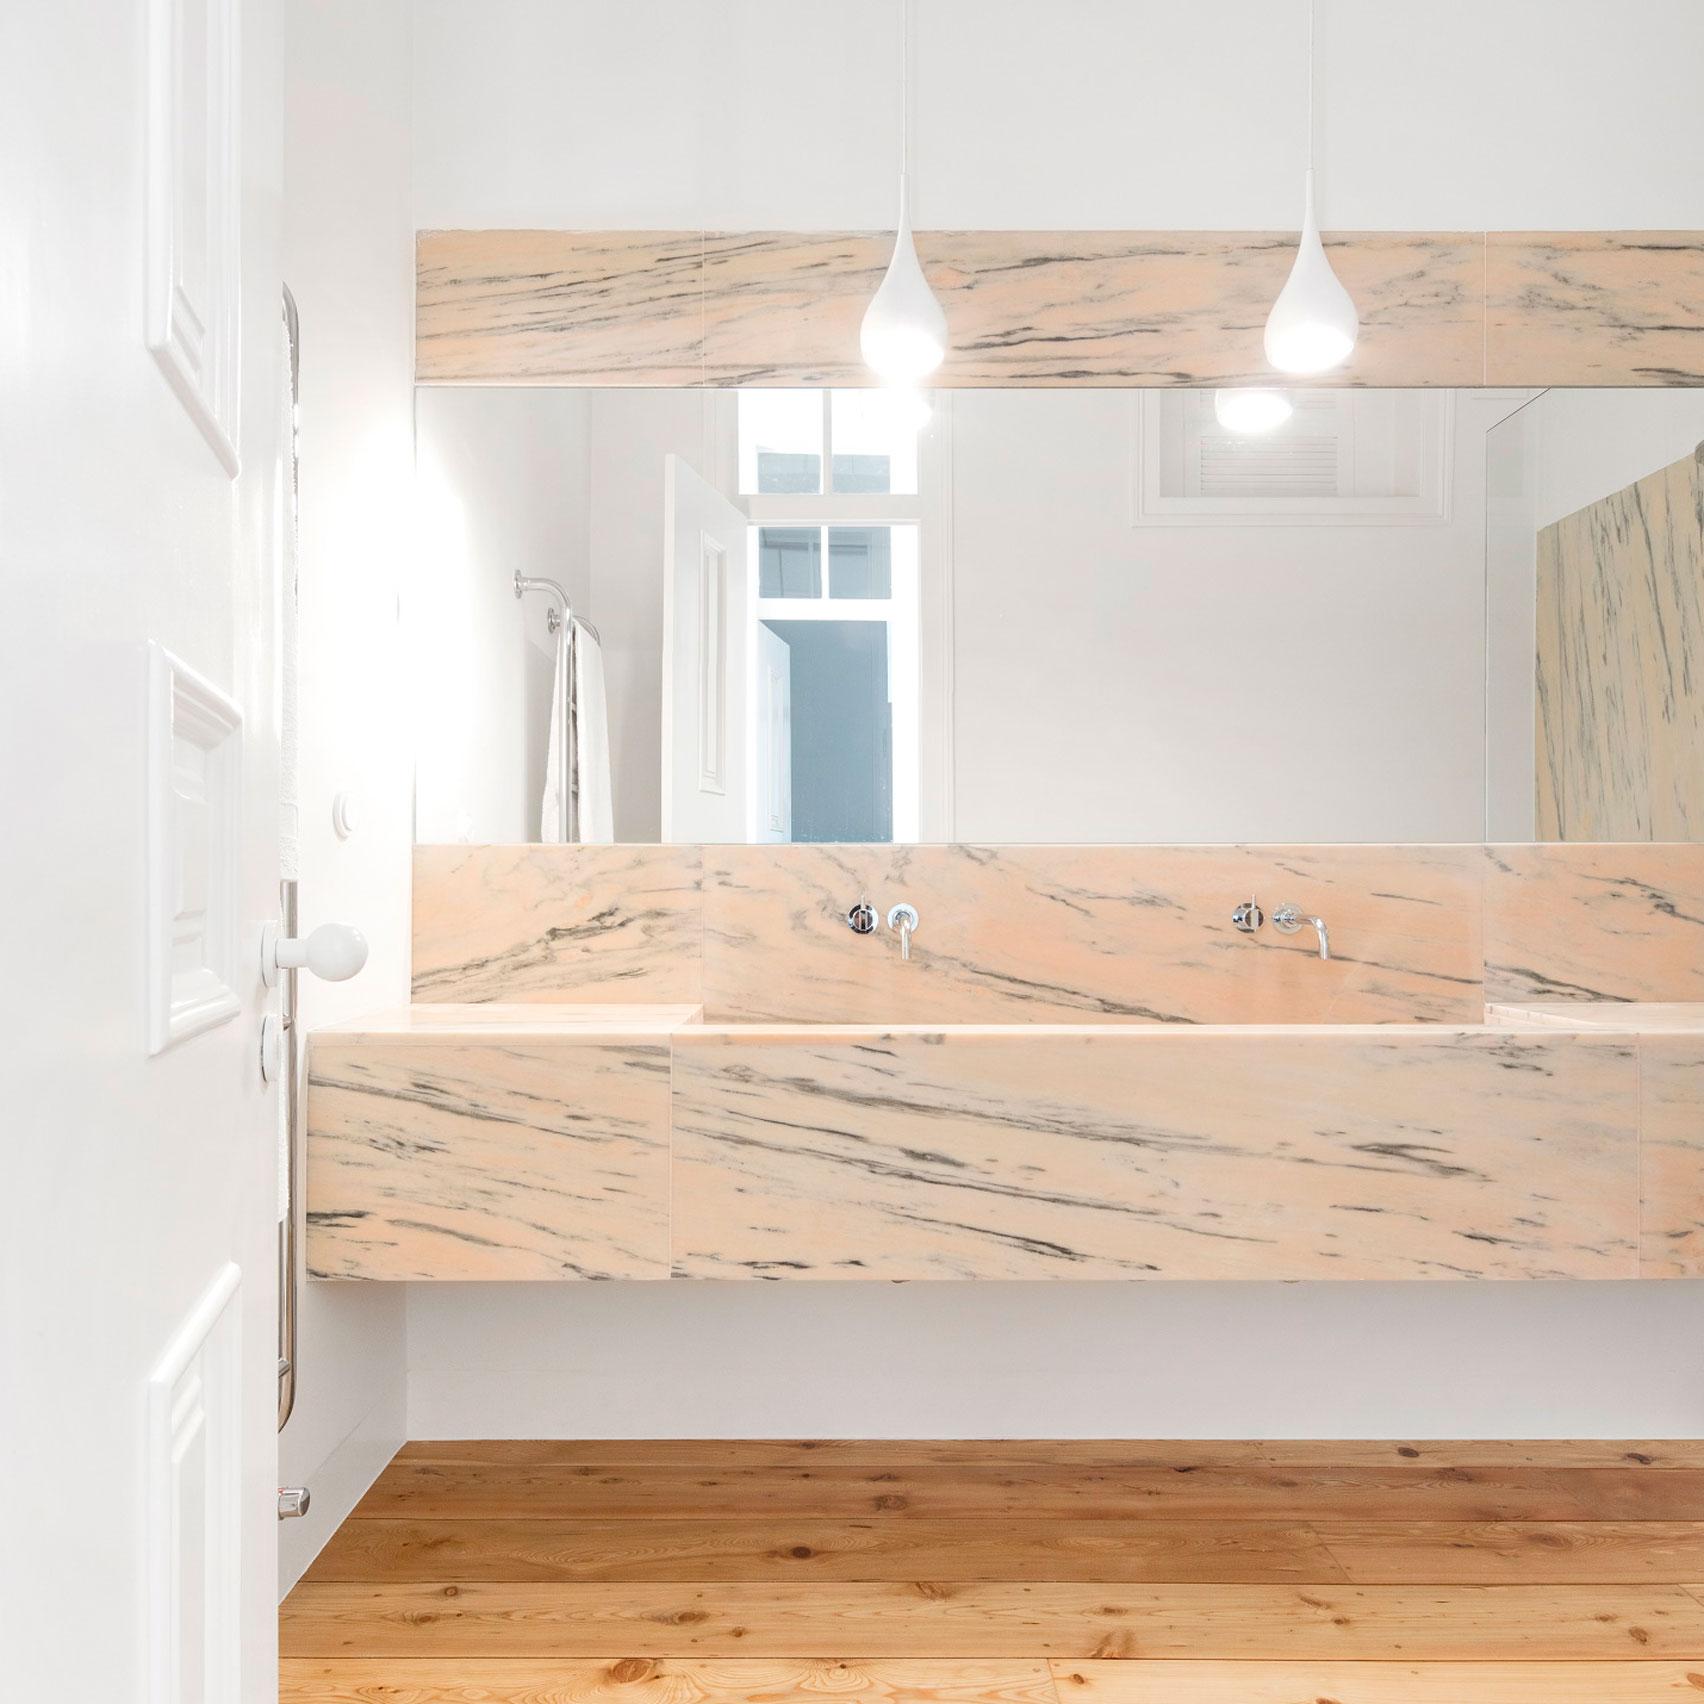 apartment-nana-rar-studio-lisbon_dezeen_sq